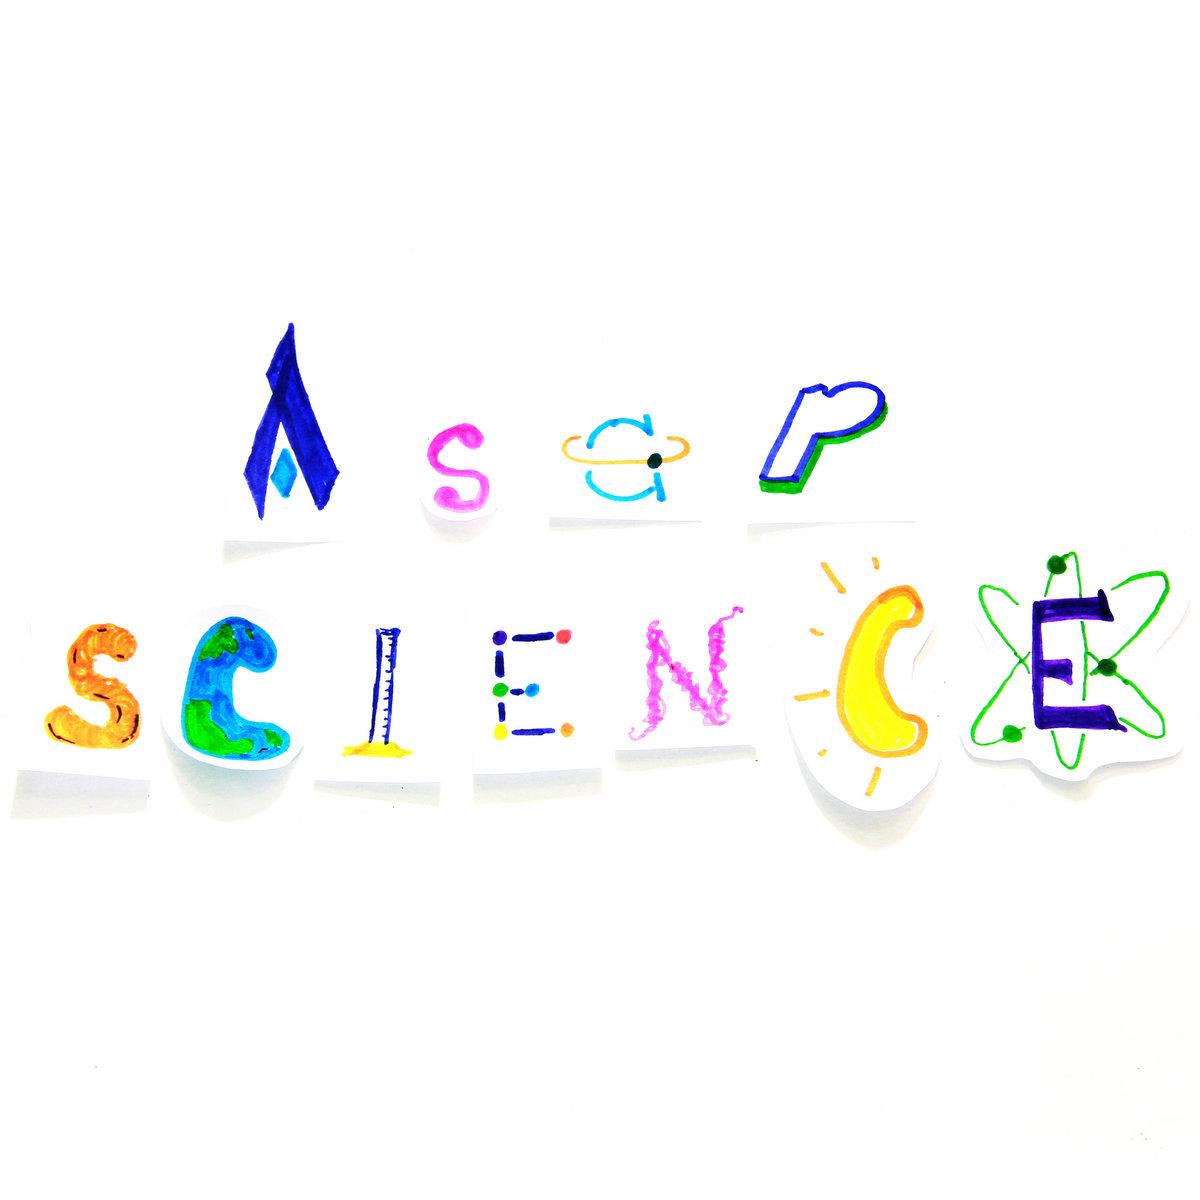 AsapSCIENCE Music | AsapSCIENCE